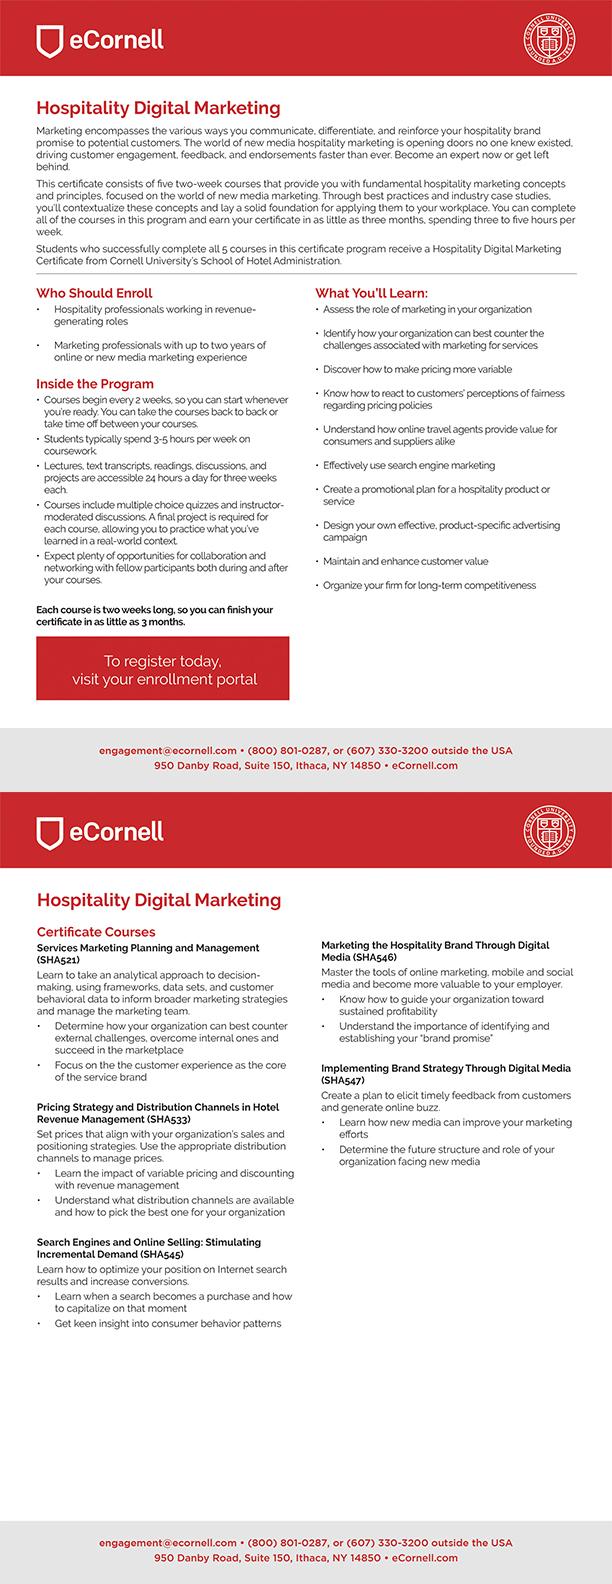 Hospitality Digital Marketing Flyer for Corporations